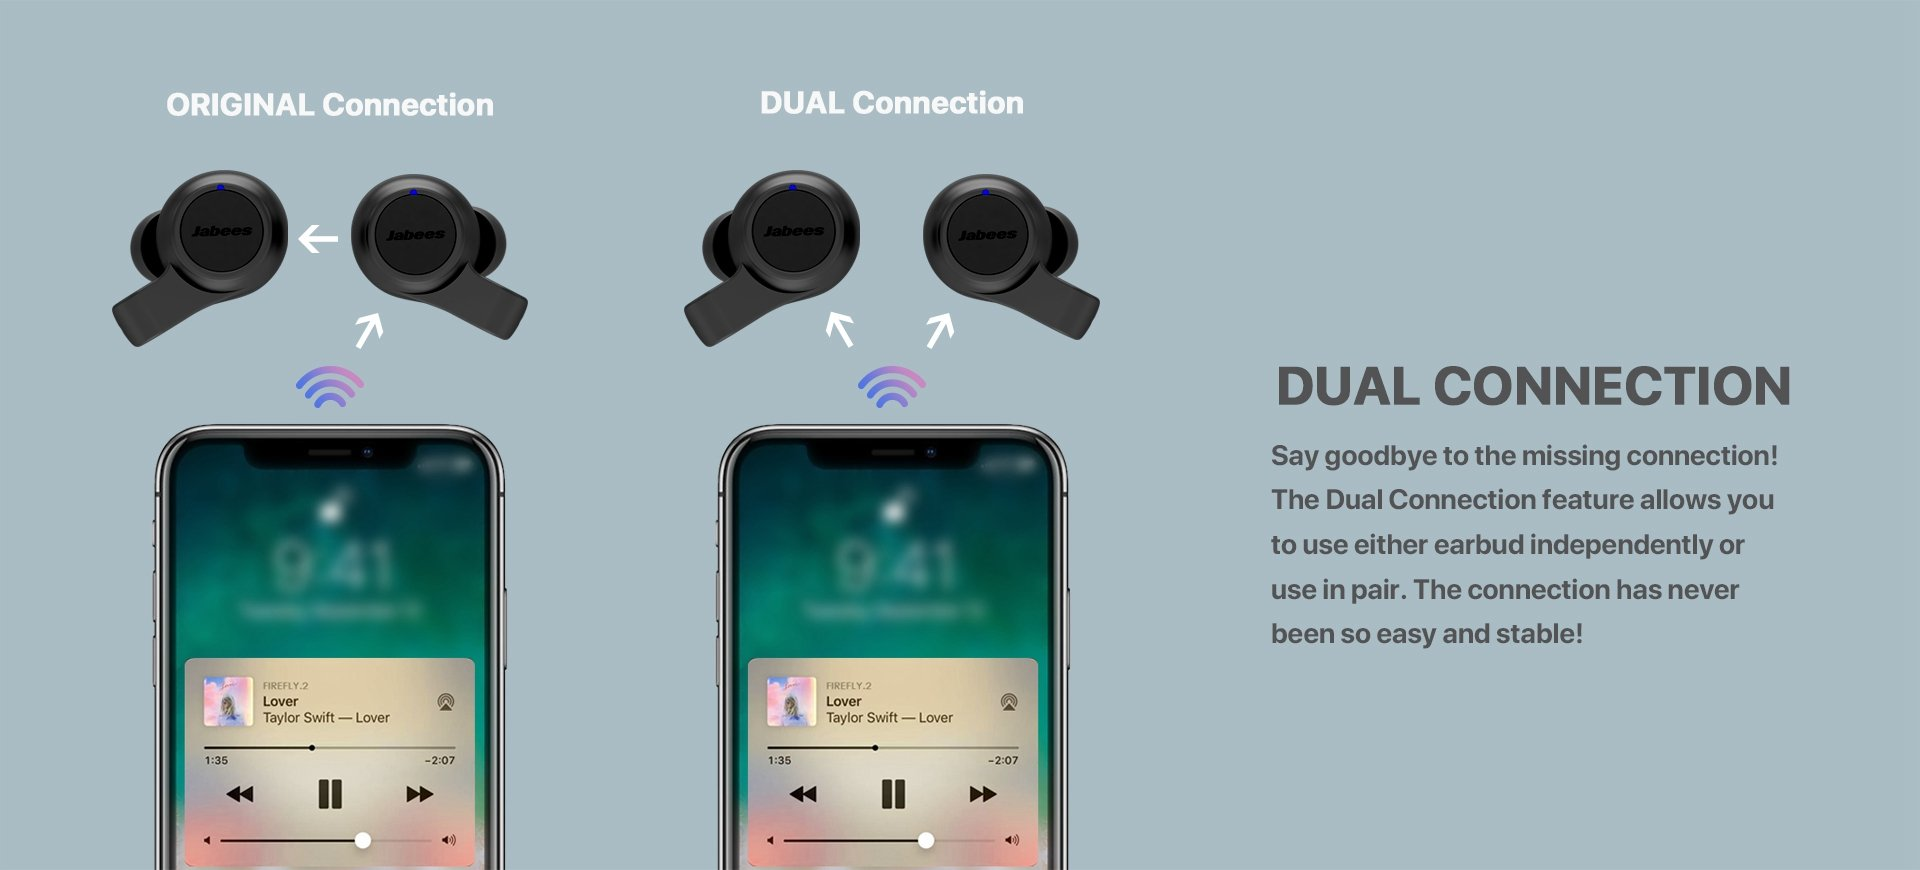 Jabees Firefly 2 Black Touch TWS Earbuds Waterproof & Dustproof IPX7 10